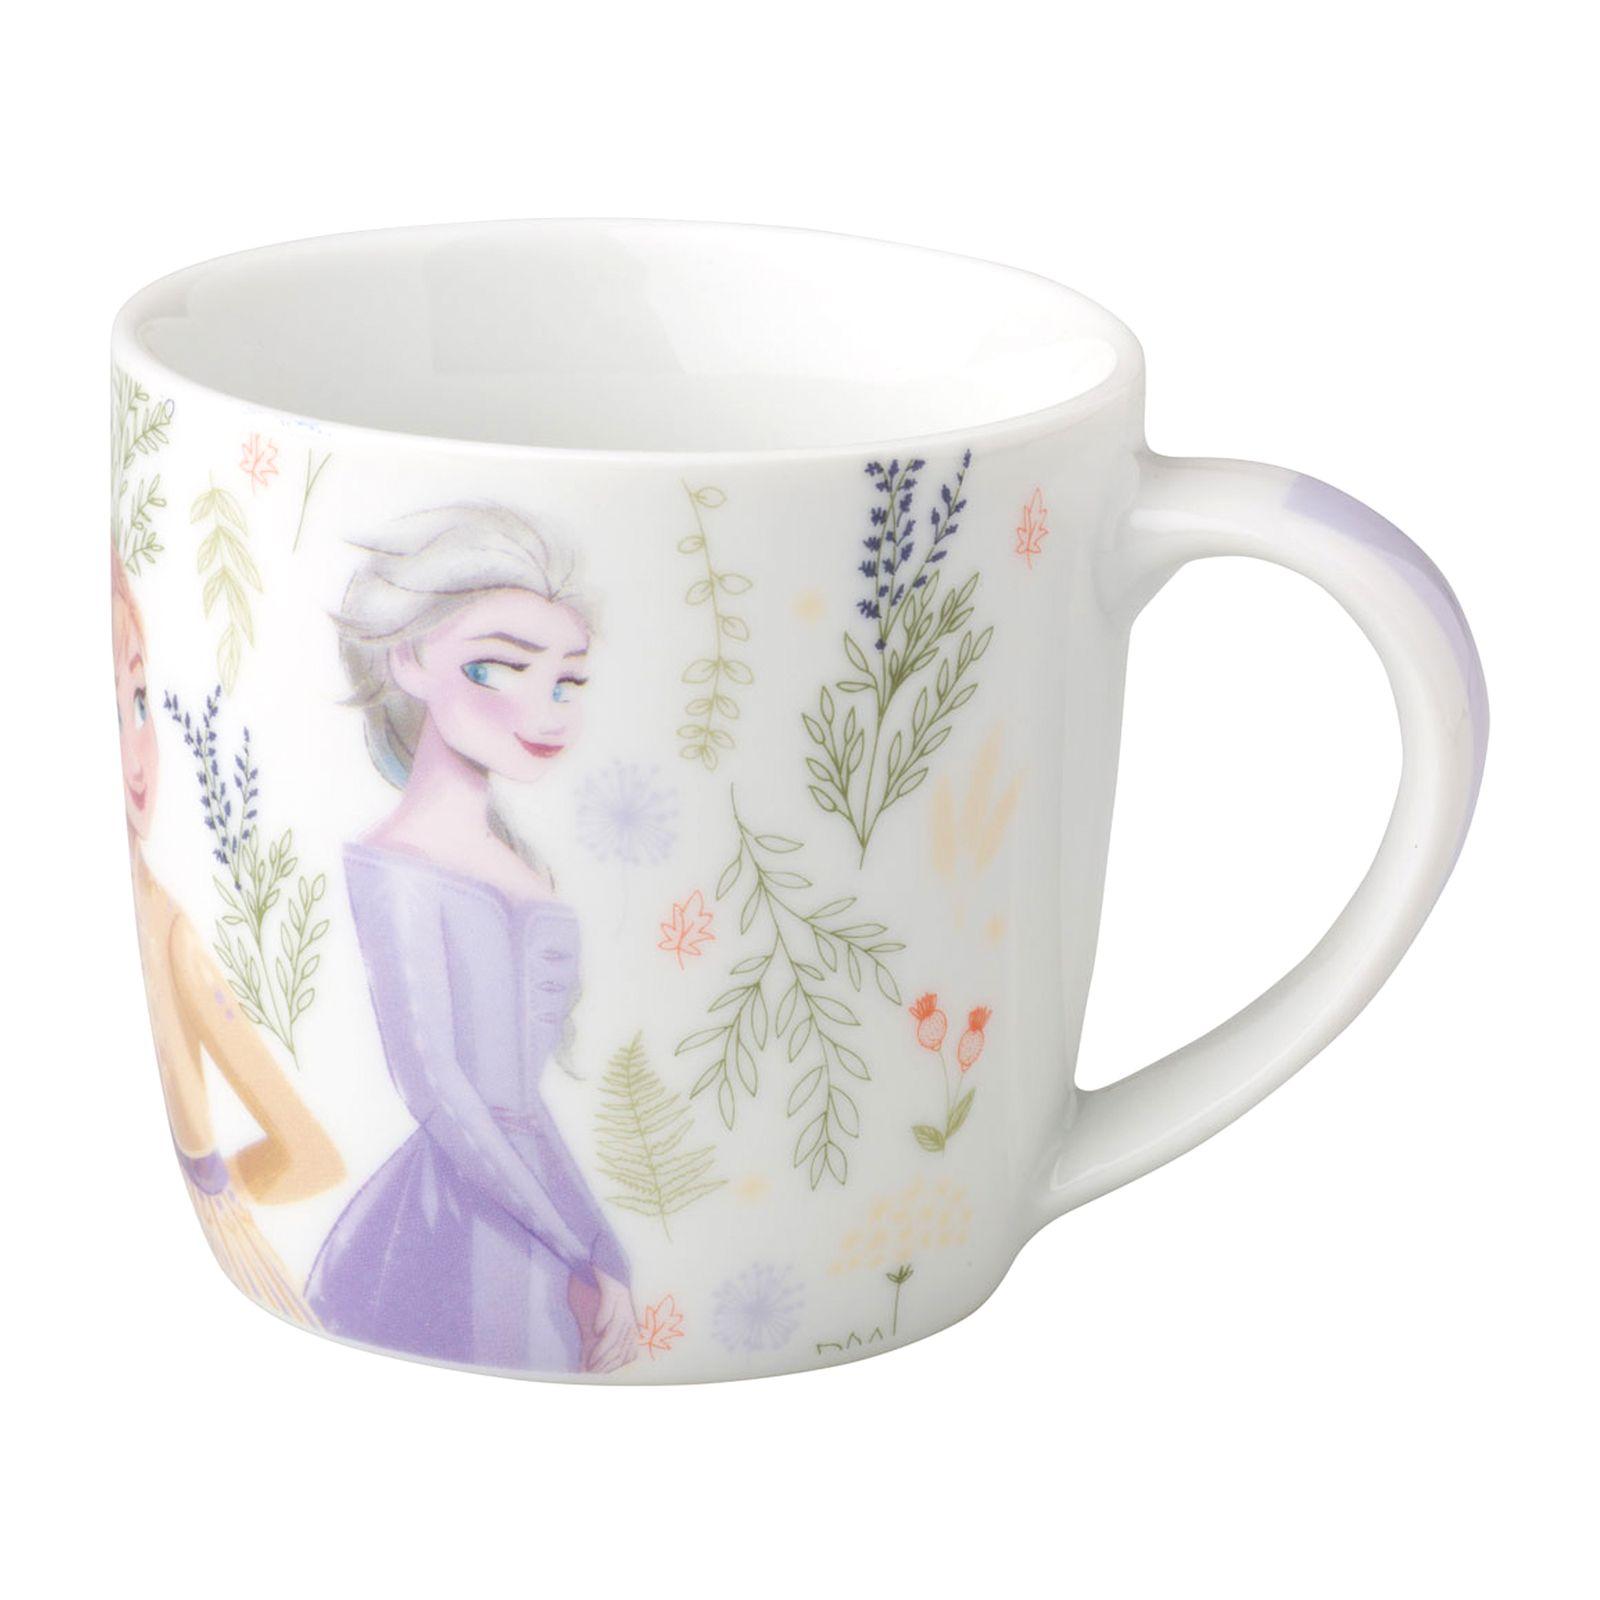 Porcelánový hrnek Frozen II Herbal 300 ml DISNEY